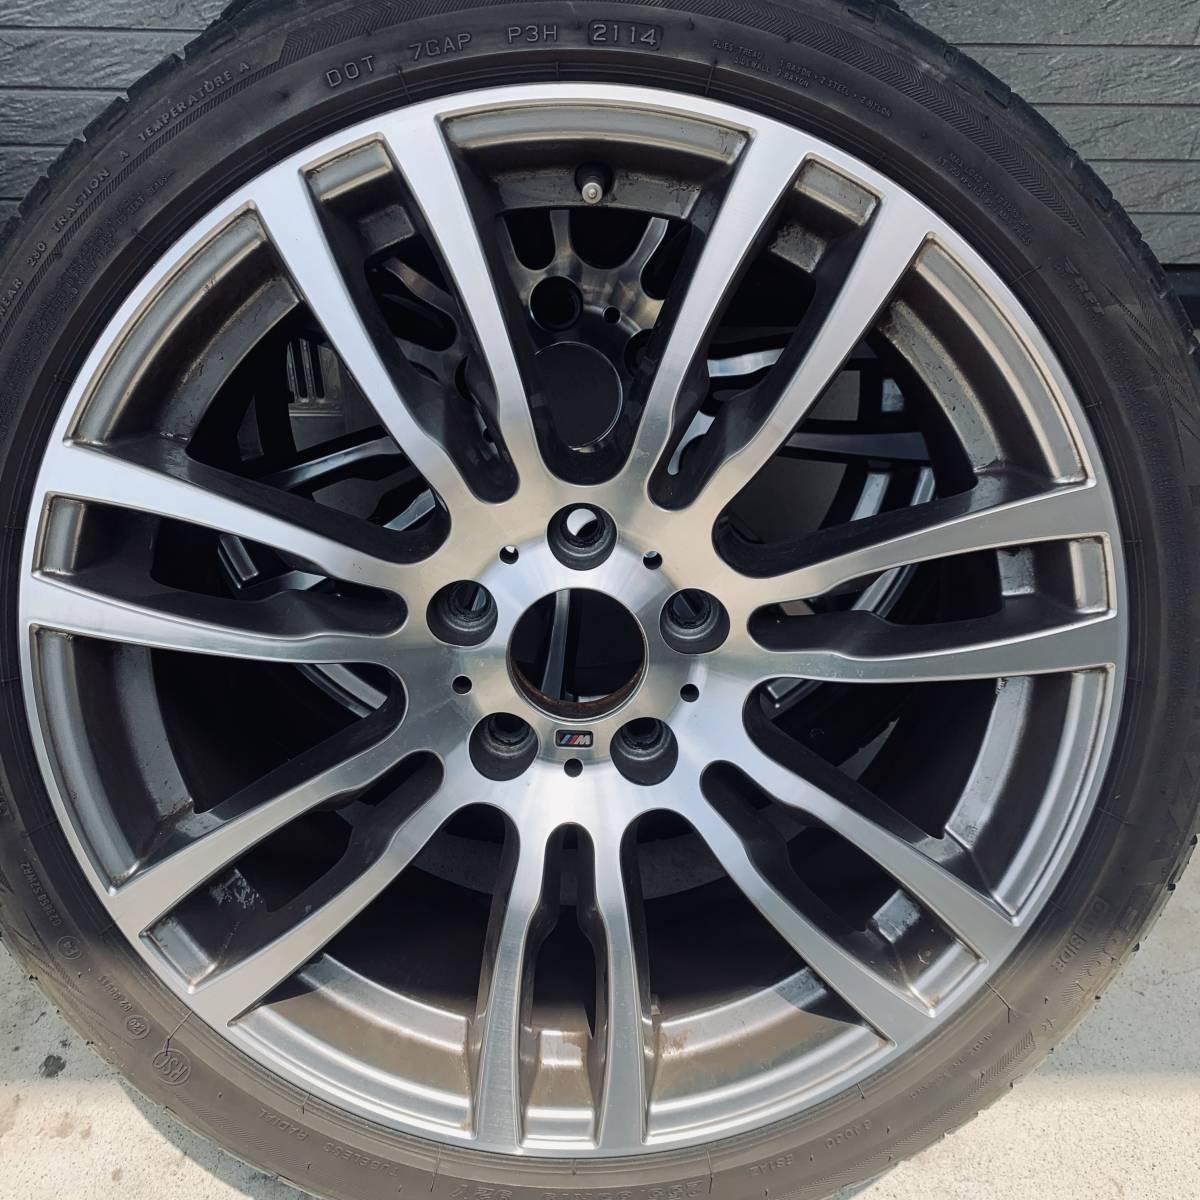 BMW 純正 オプション 19インチ スタースポーク スタイリング403M Mスポーツ PCD:120 F: 8.0J +36 R: 8.5J +47 F30 F31 3シリーズ_画像6